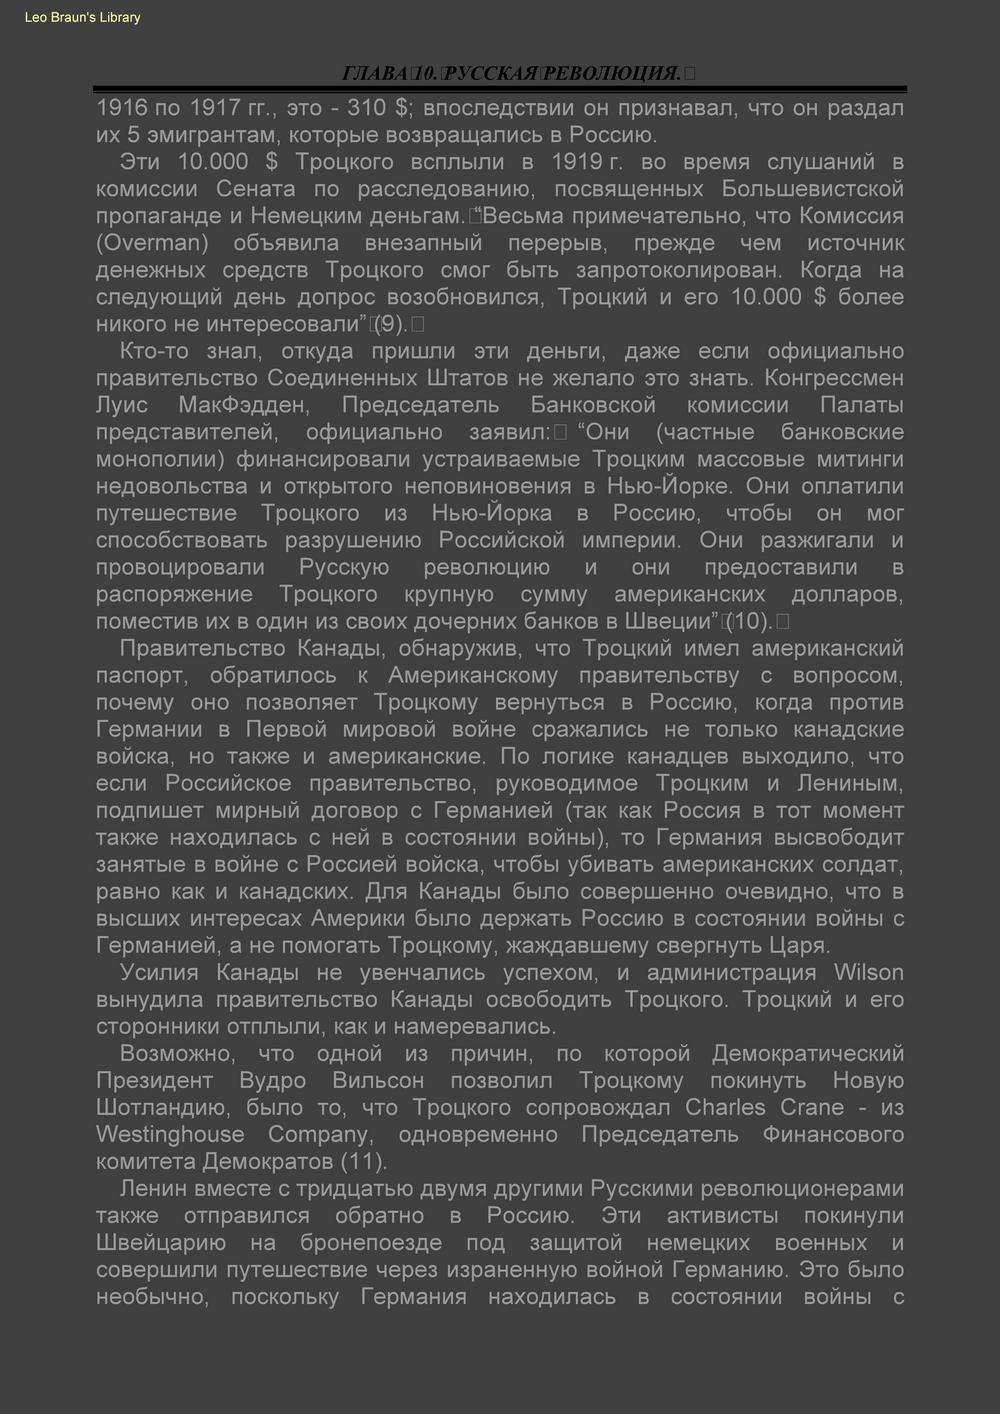 http://i2.imageban.ru/out/2014/01/03/3e0d223772a5274c9e1ad95c4361c219.jpg